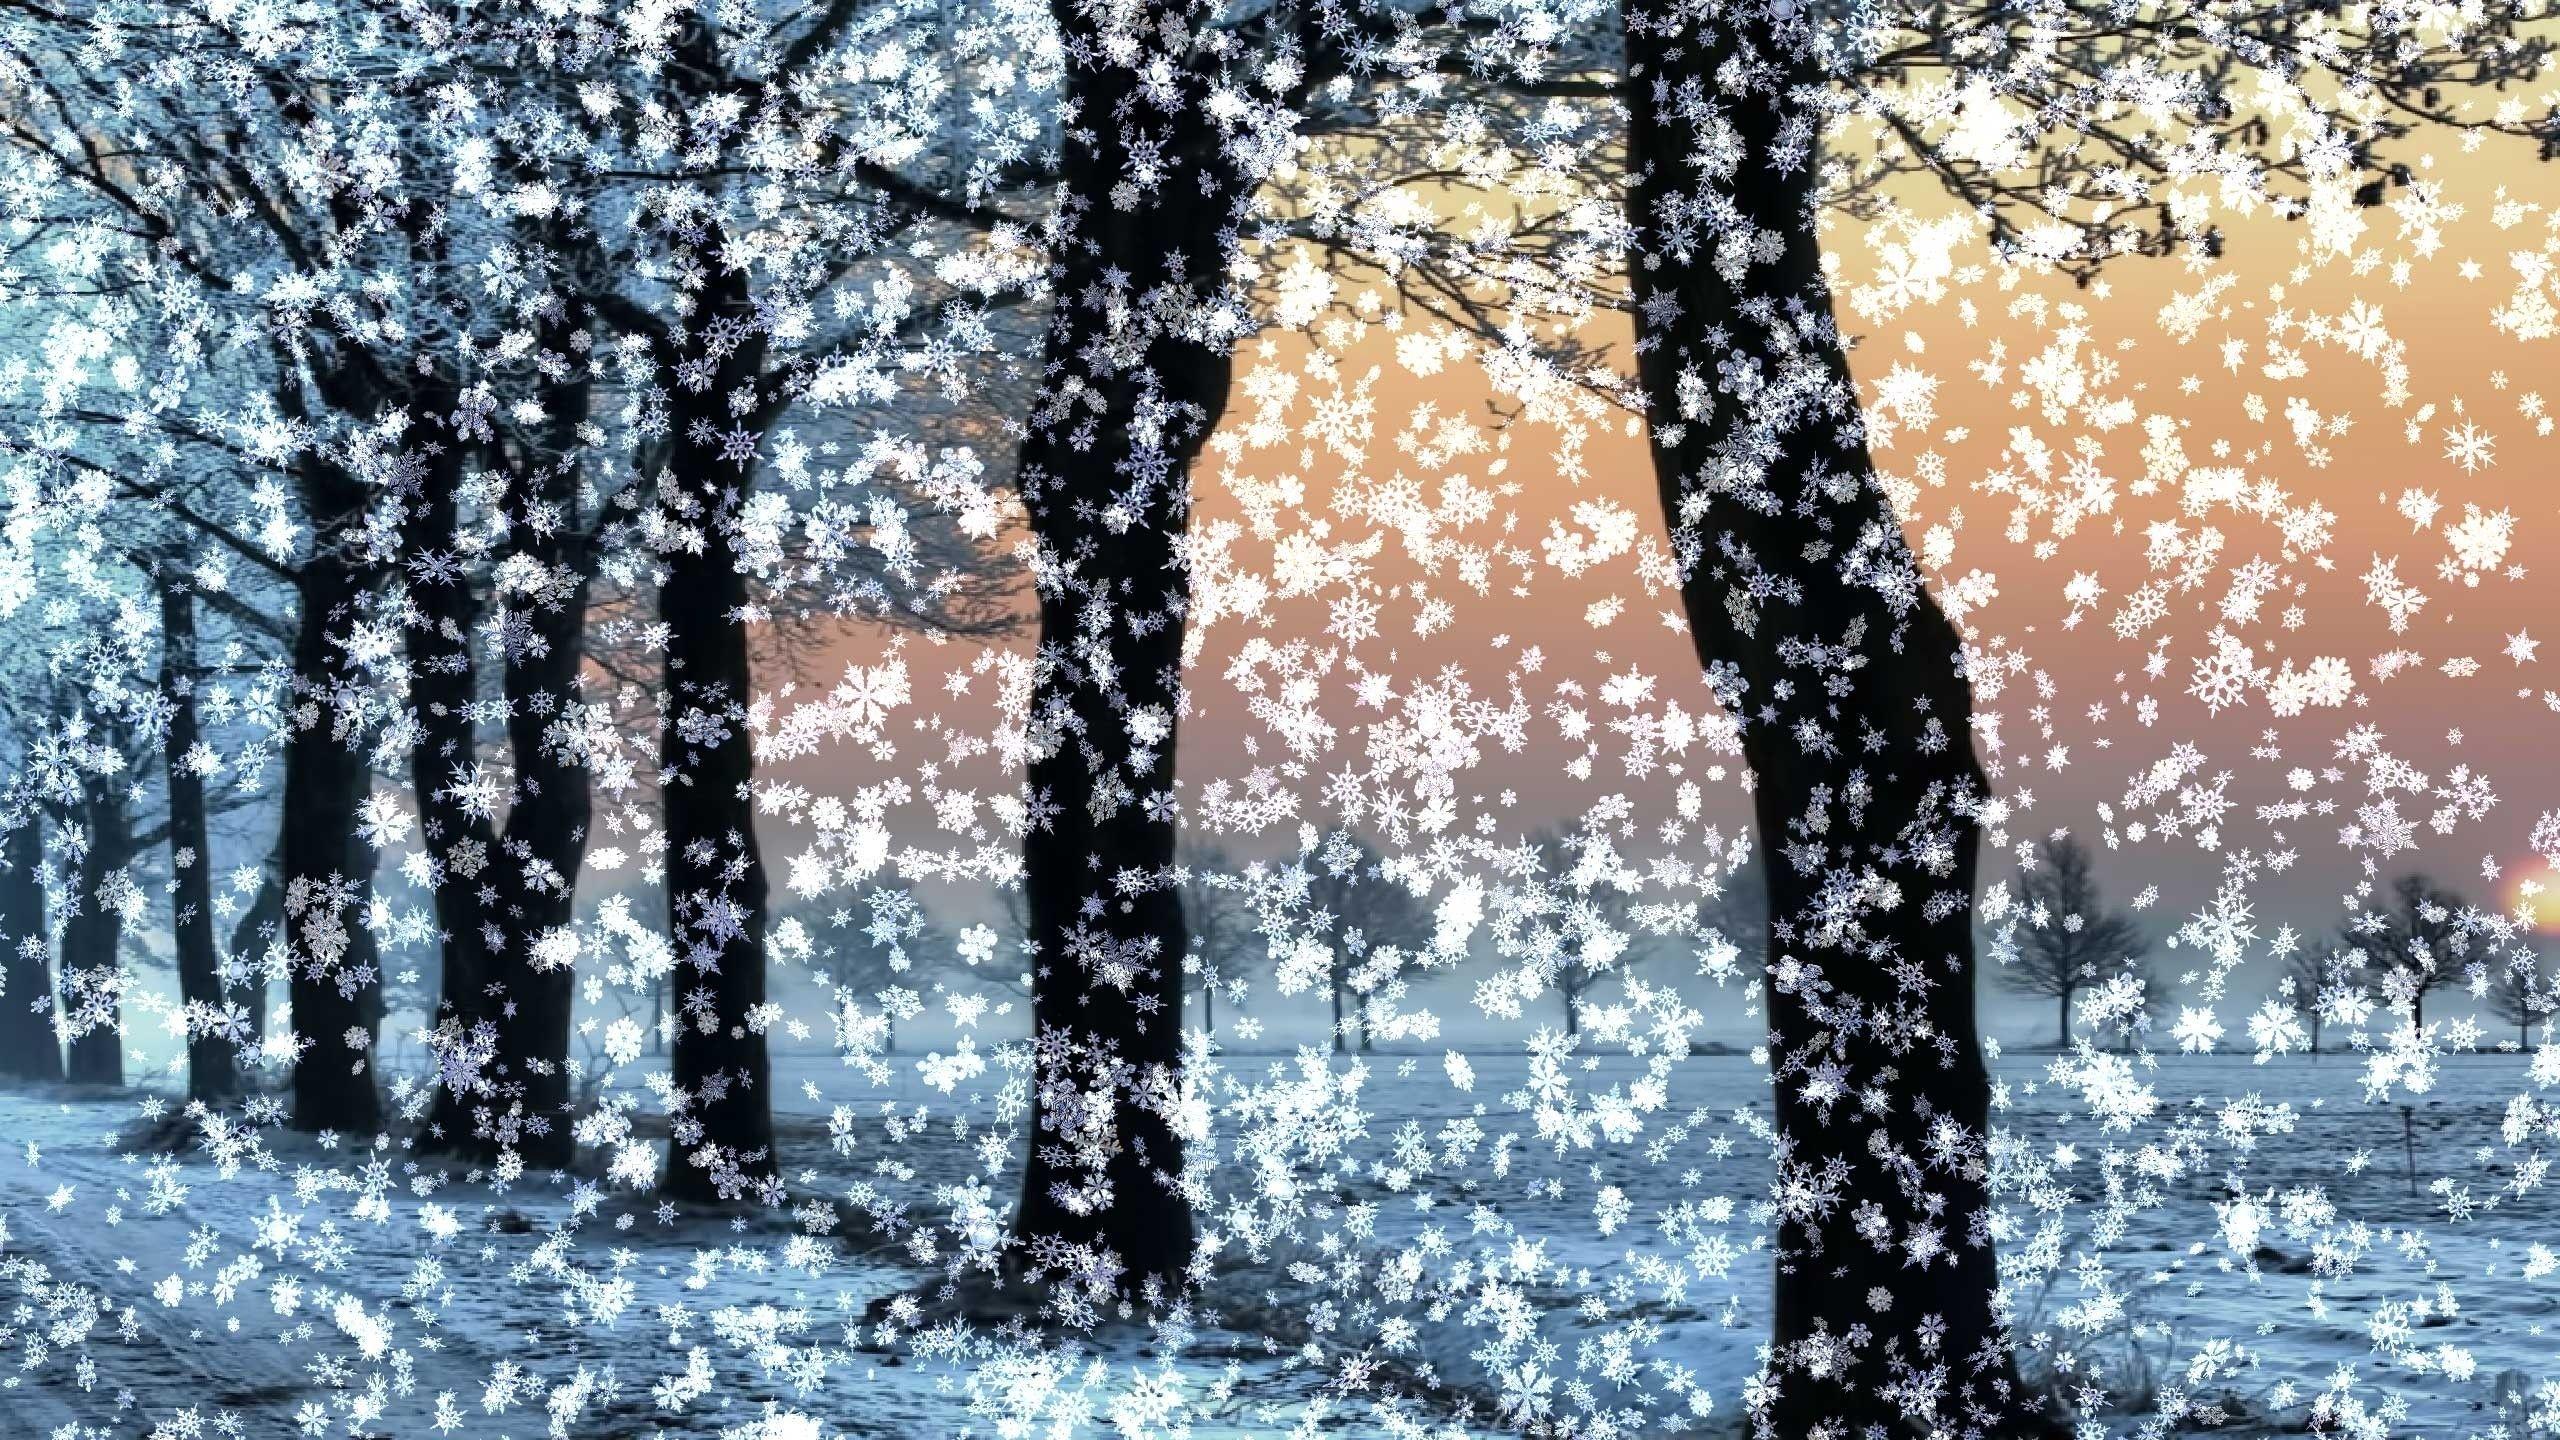 Elegant Winter Live Wallpaper Winter Desktop Background Free Winter Wallpaper Winter Wallpaper